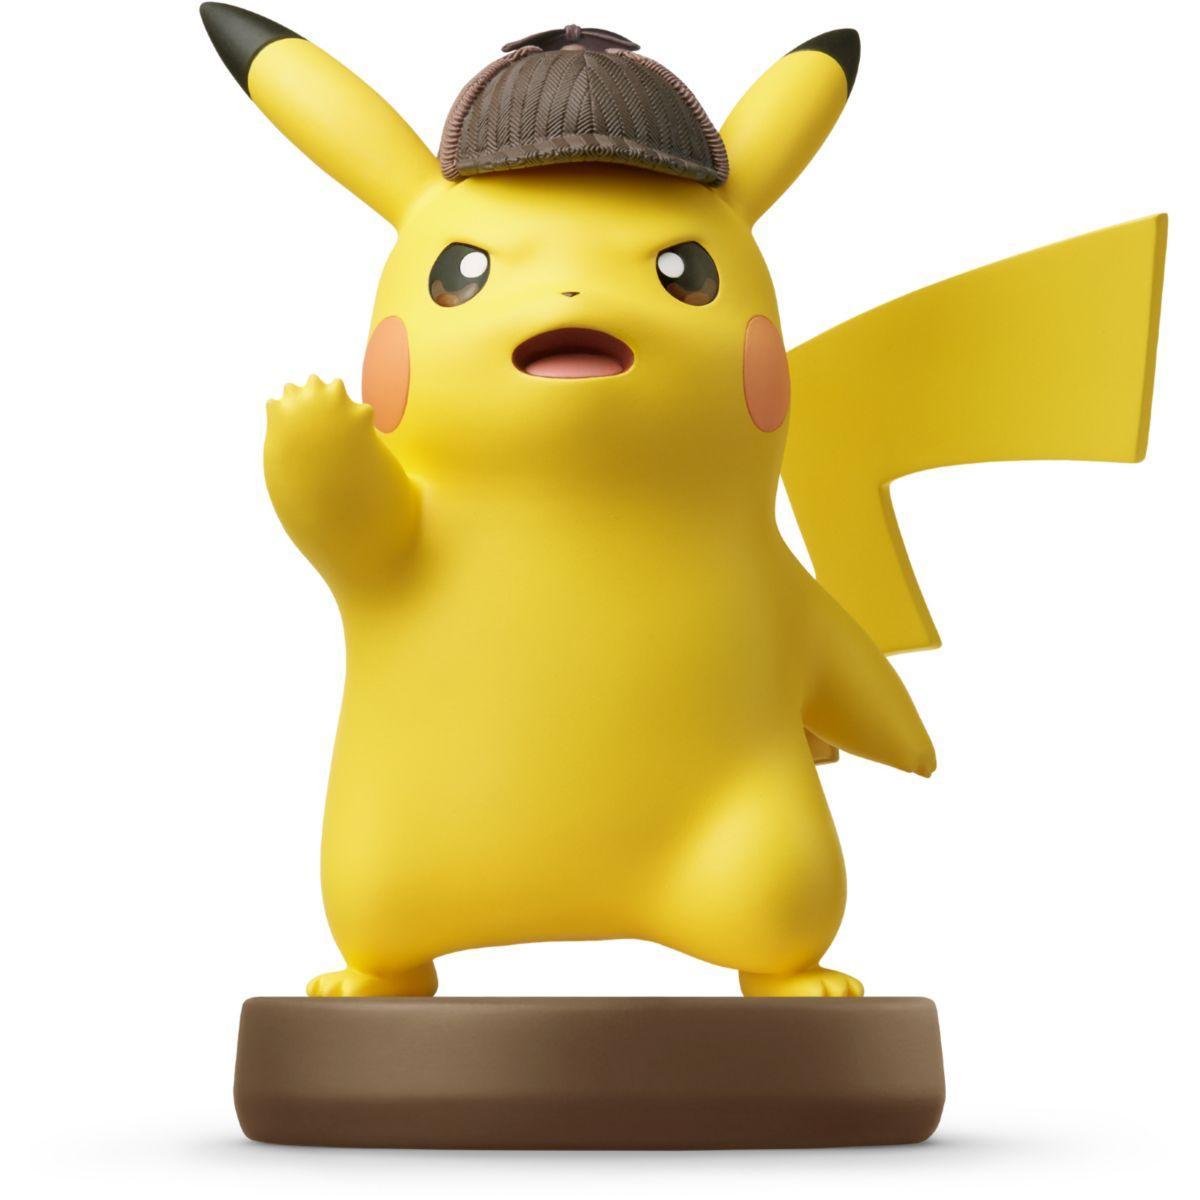 Figurine amiibo nintendo amiibo d�tective pikachu - 2% de remise imm�diate avec le code : cadeau2 (photo)